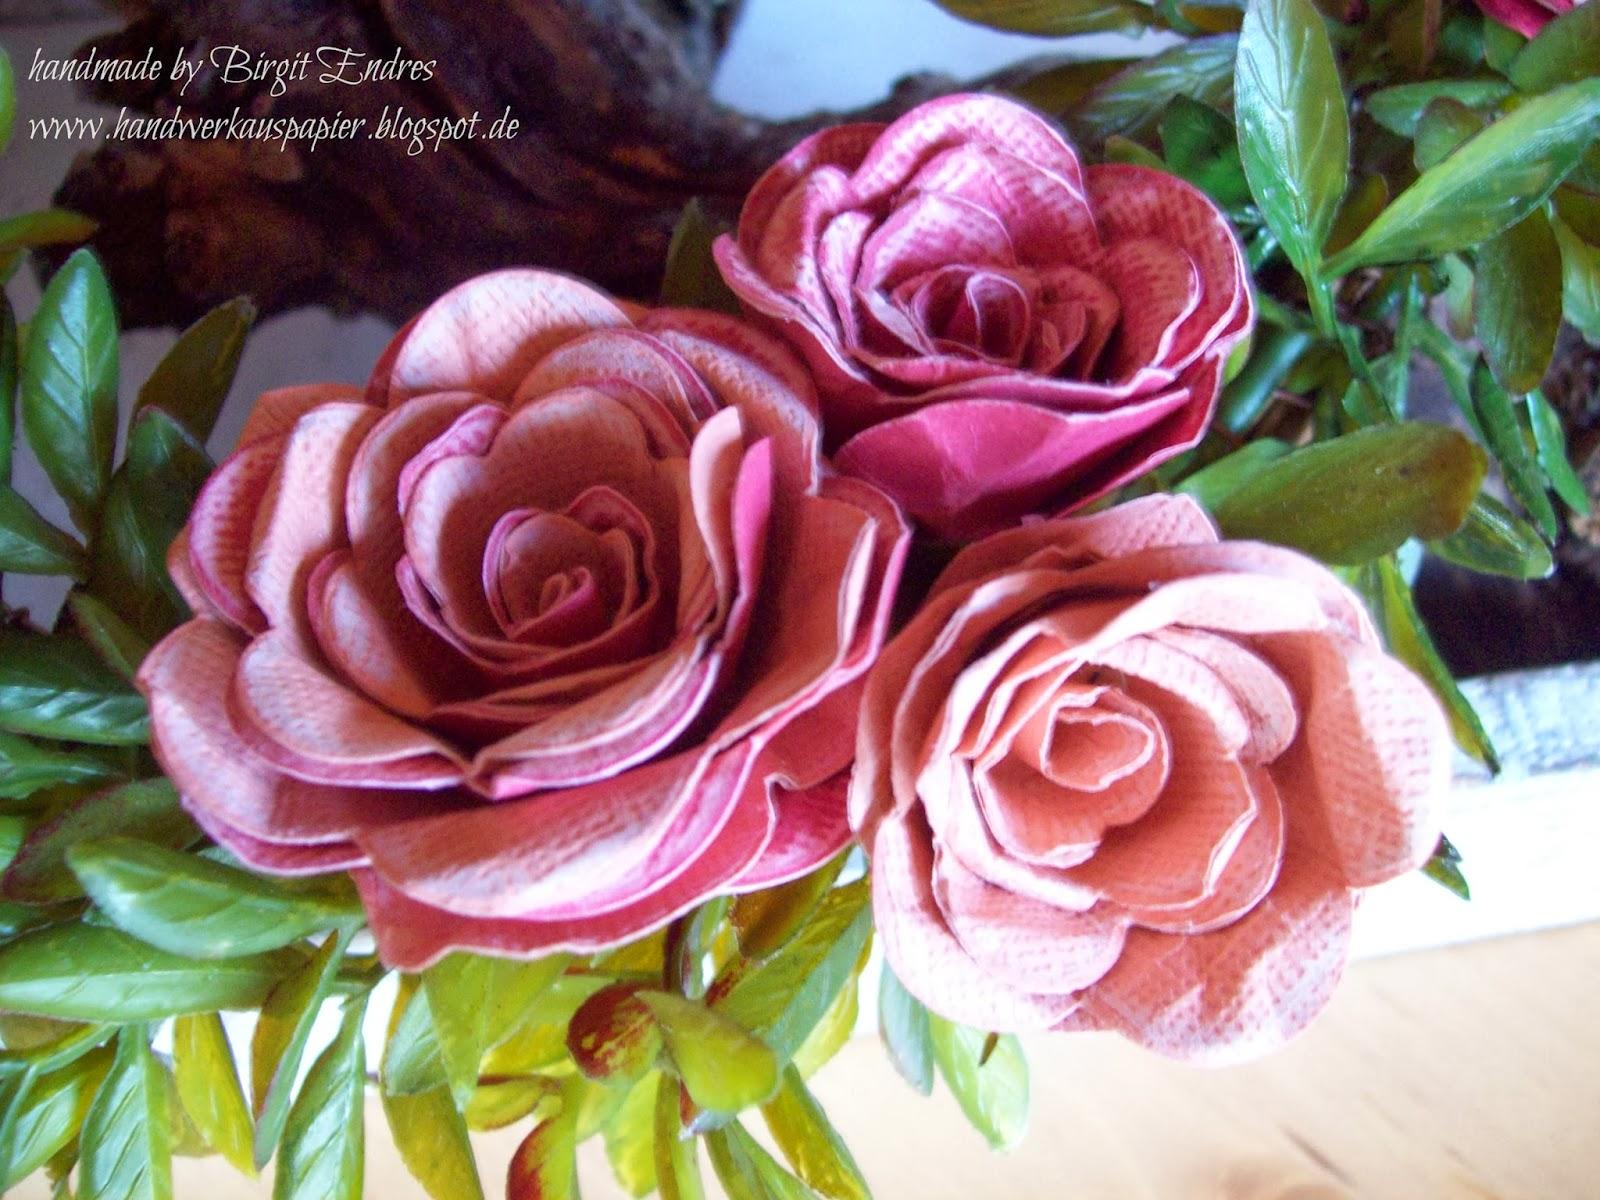 handwerk aus papier rosen tulpen nelken alle blumen welken. Black Bedroom Furniture Sets. Home Design Ideas